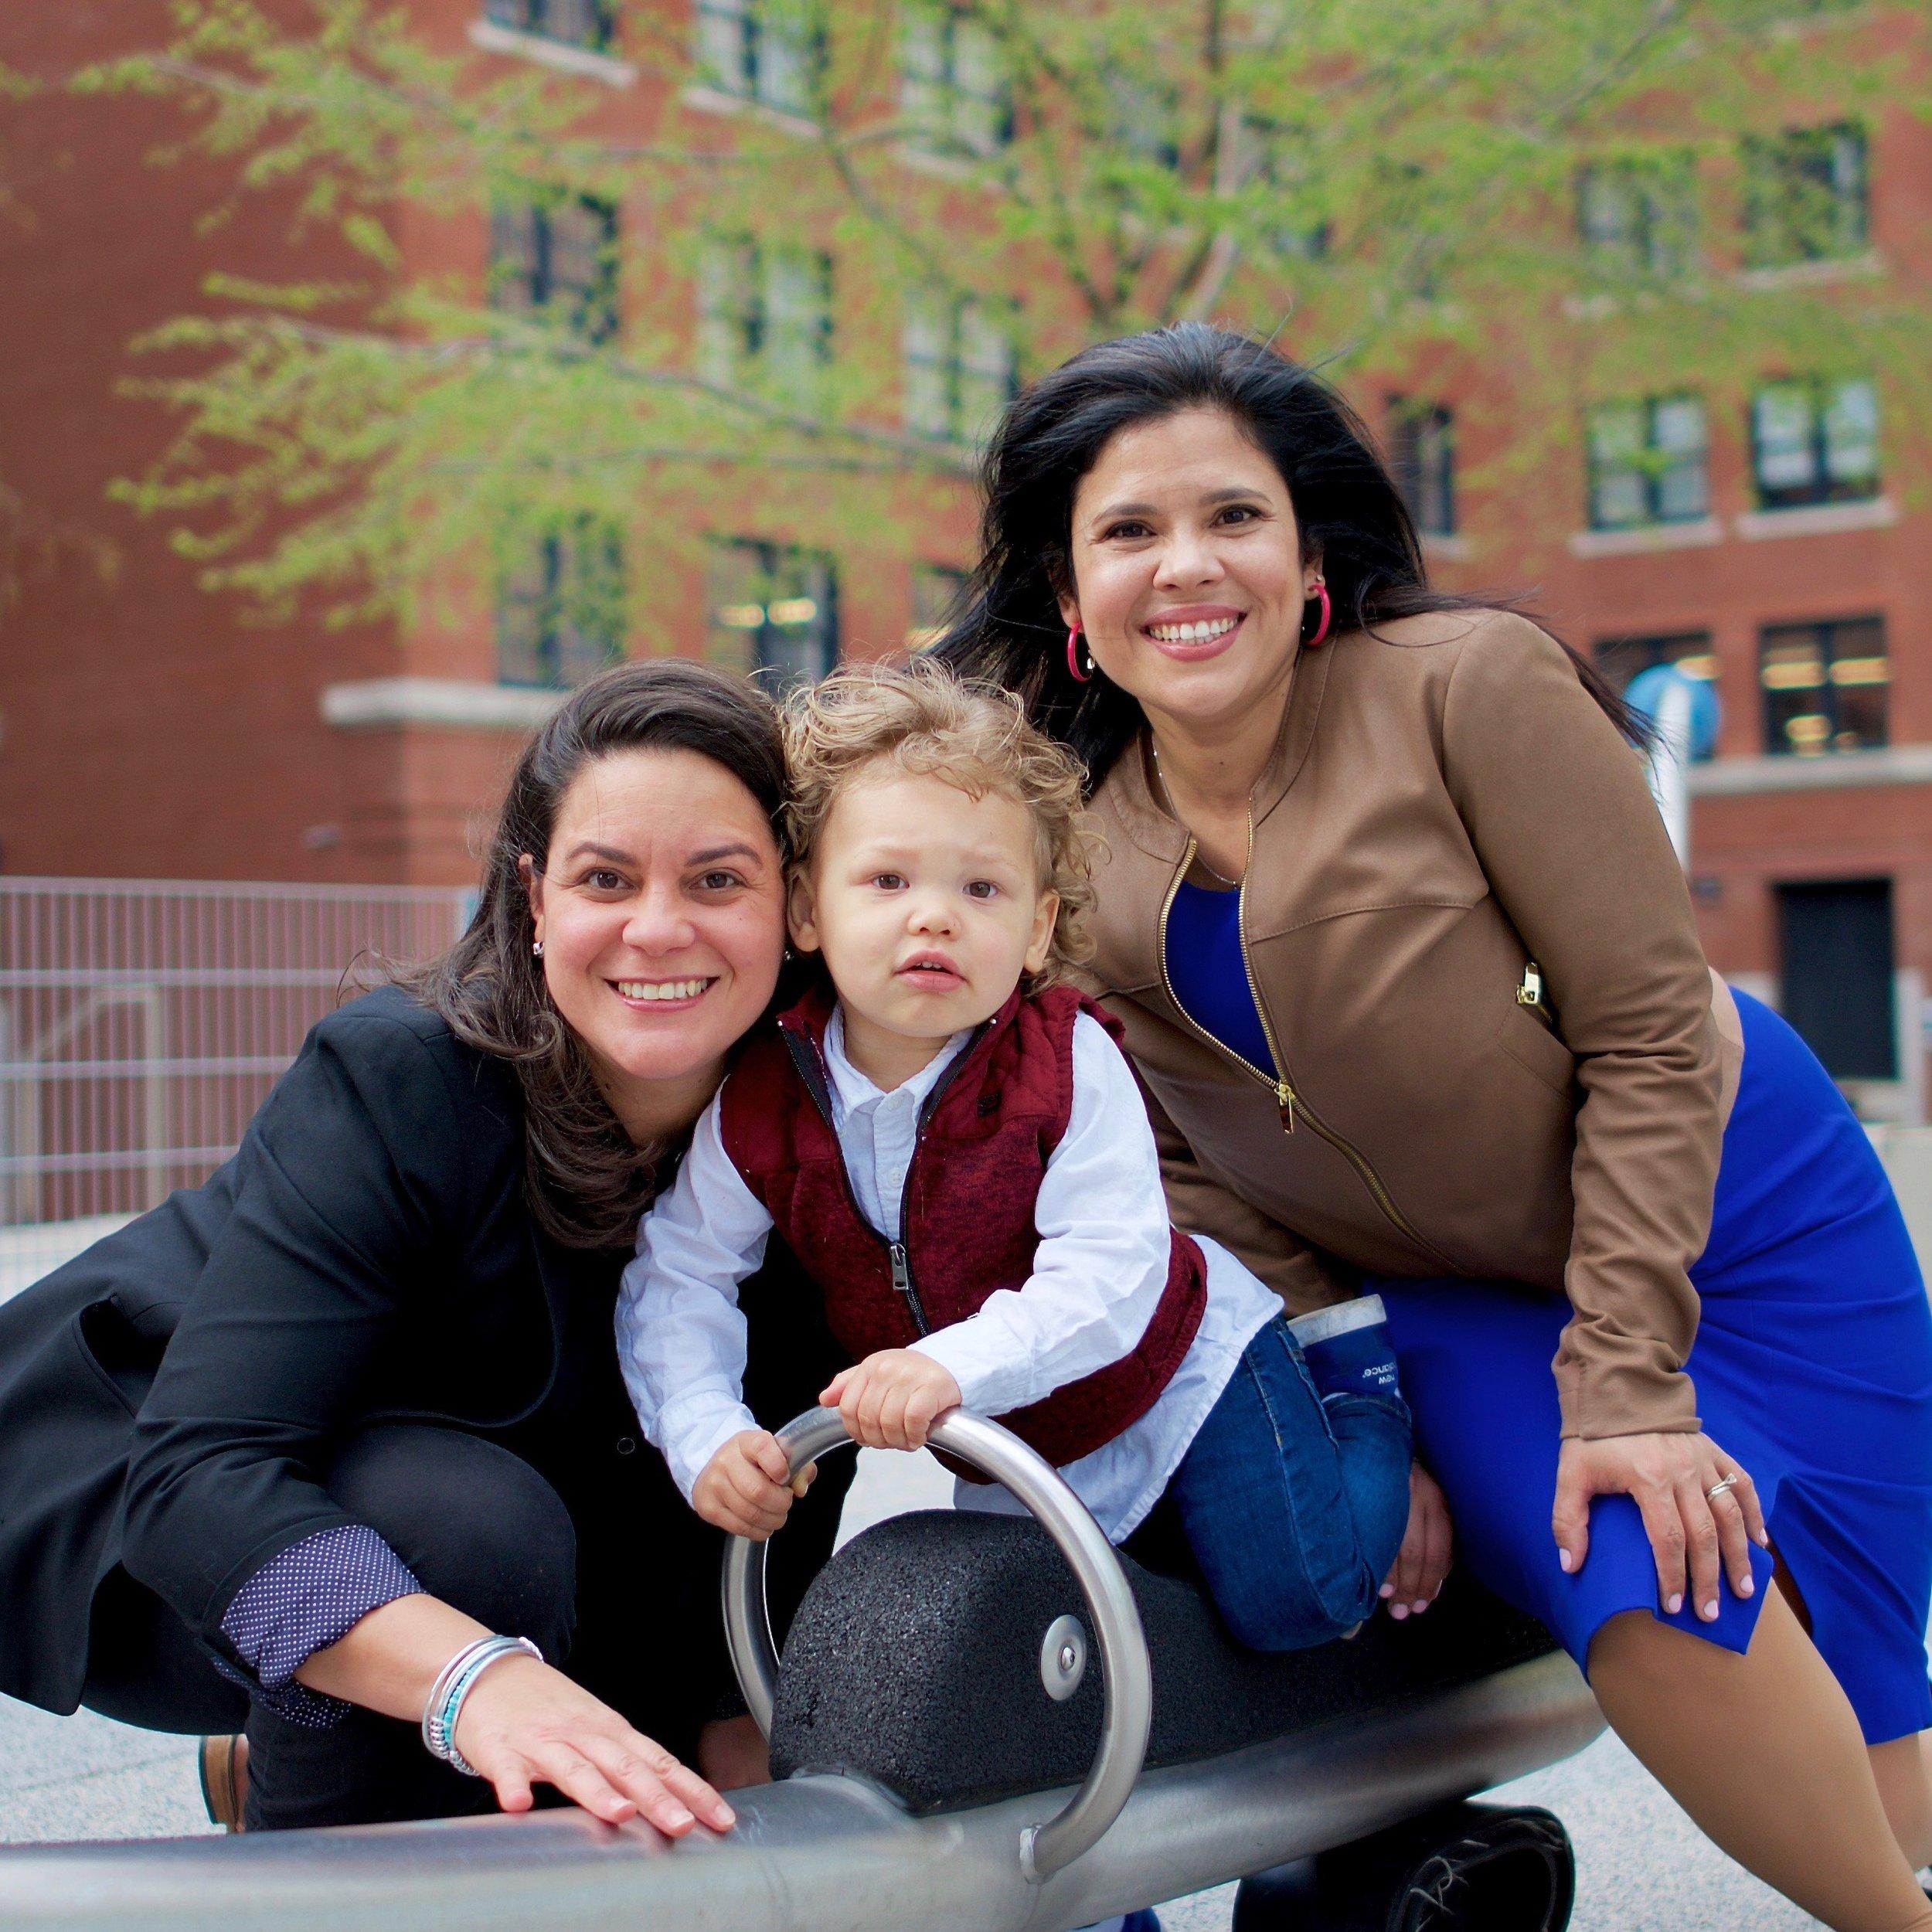 Featured: Josiane Martinez, José Alejandro Martinez-St. Guillen and Alejandra St. Guillen